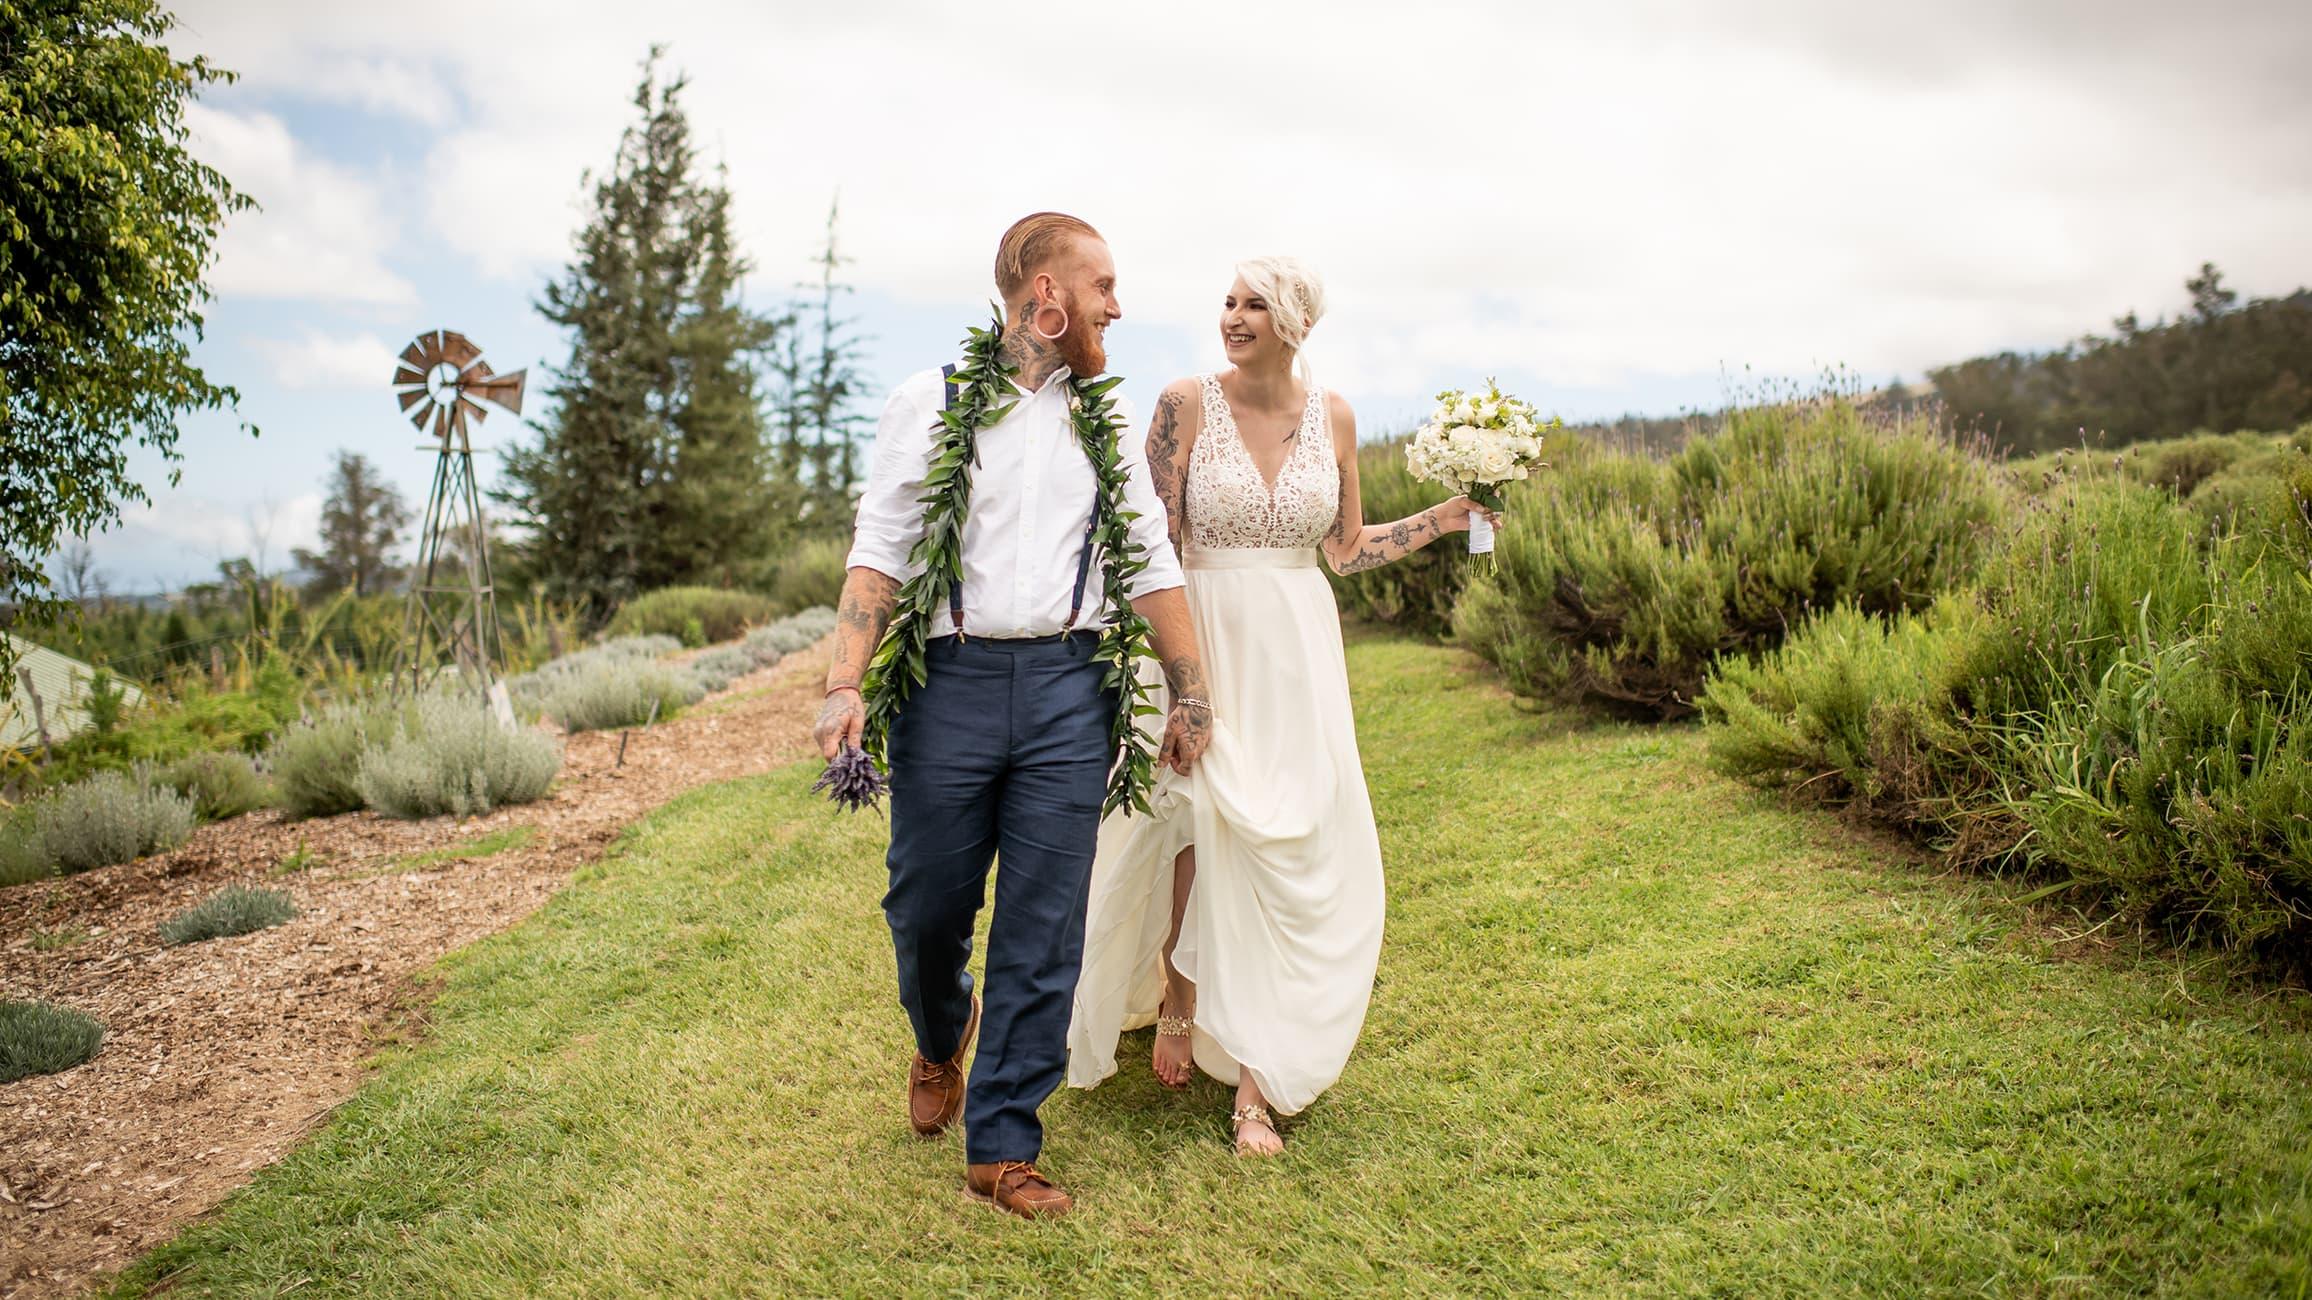 J. Anthony Martinez Photography Maui Wedding Photographer Alii Kula Lavender A Maui Wedding Day Elizabeth Miller _ David Hallmark-3297